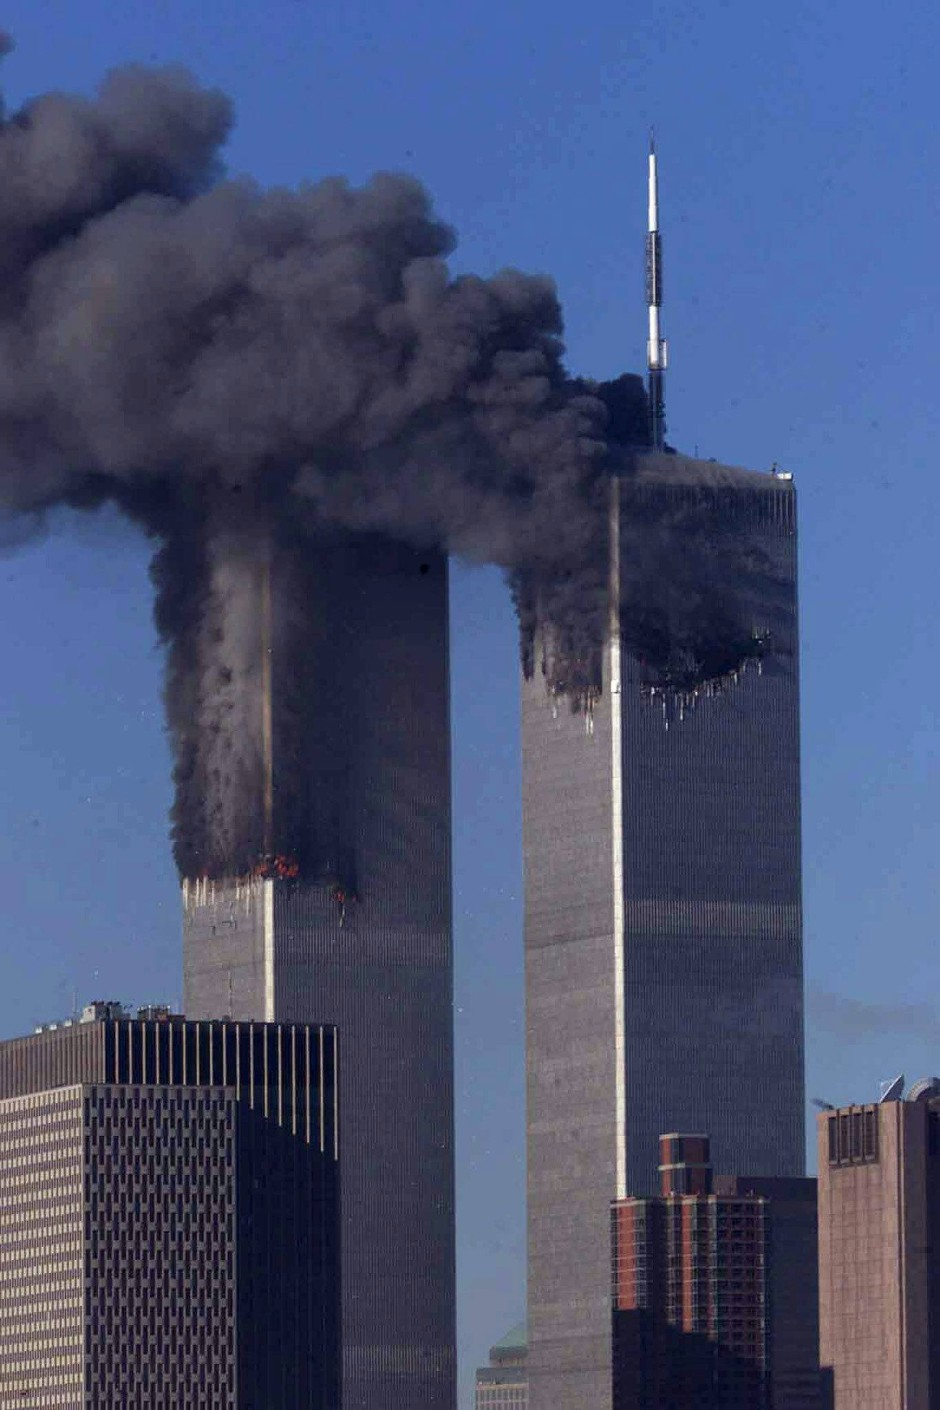 Prozess in guant namo weltreisender des dschihadismus for Ingenieur studium nc